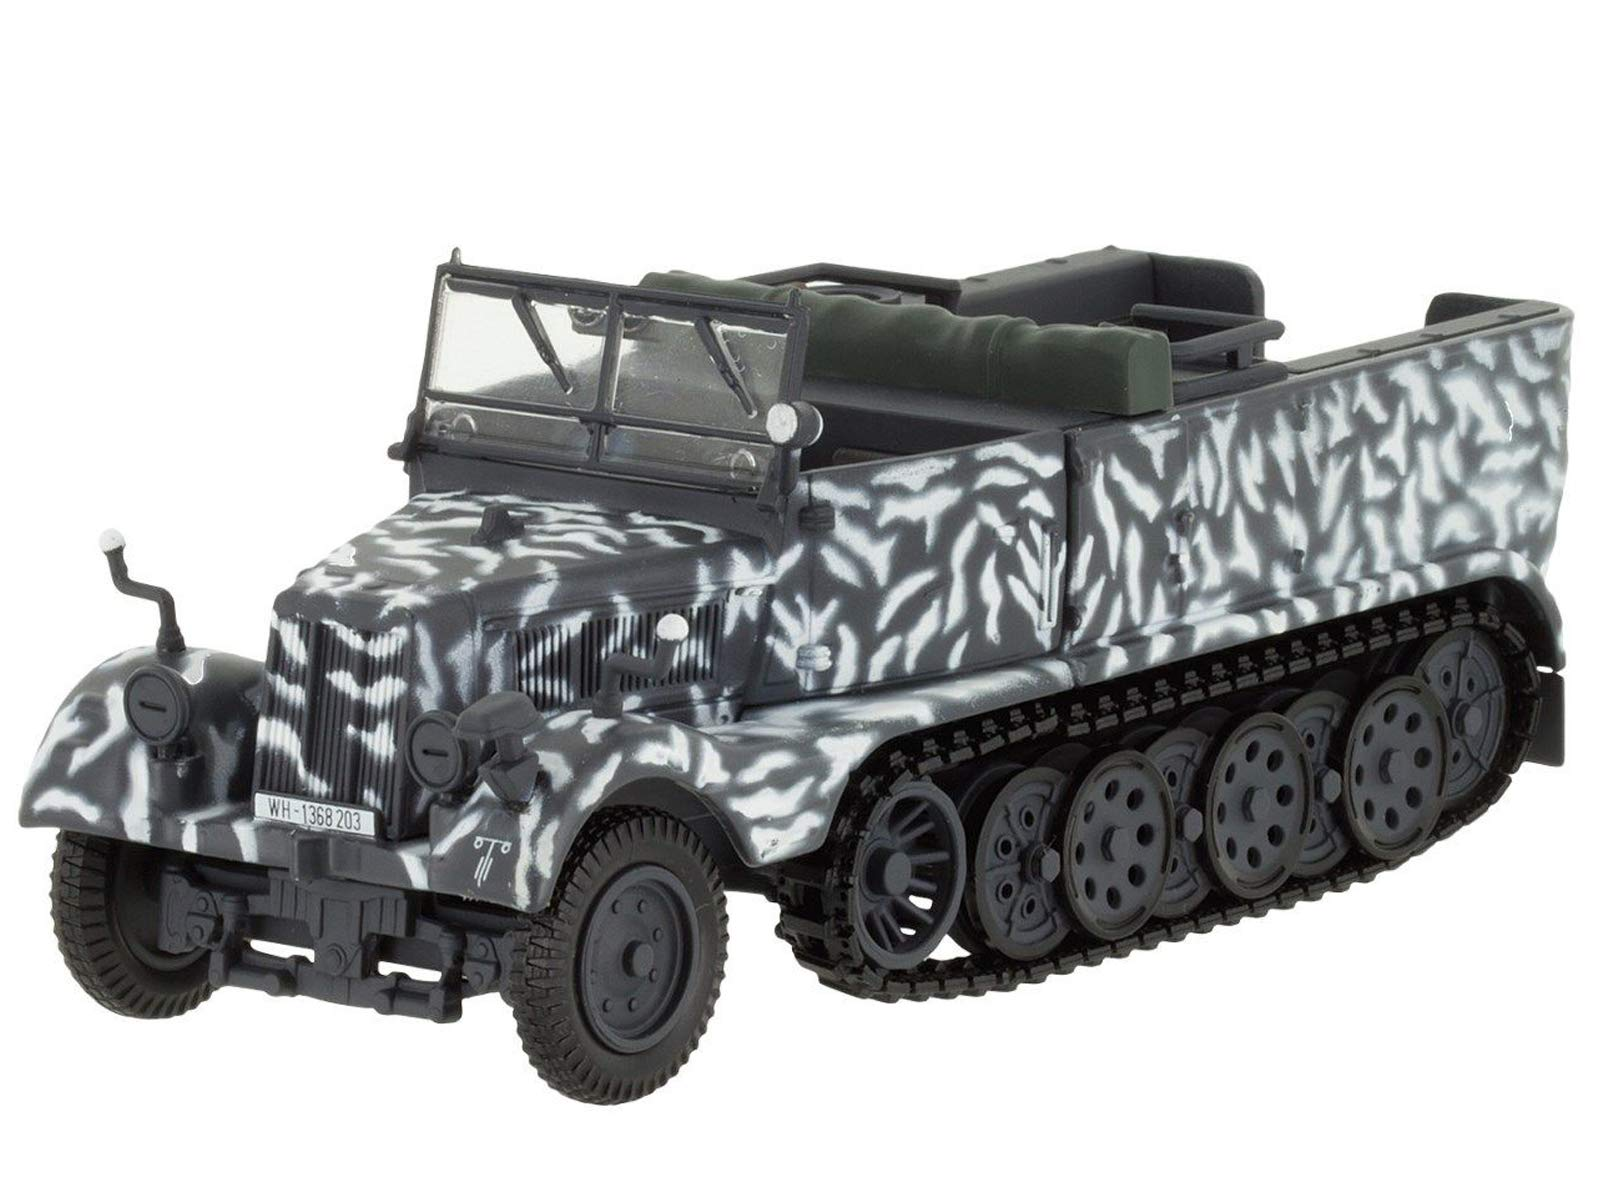 Sonderkraftfahrzeug Sd.Kfz 1942 Year German Special Purpose Vehicle 1/43 Collectible Model Vehicle Special Ordnance Vehicle